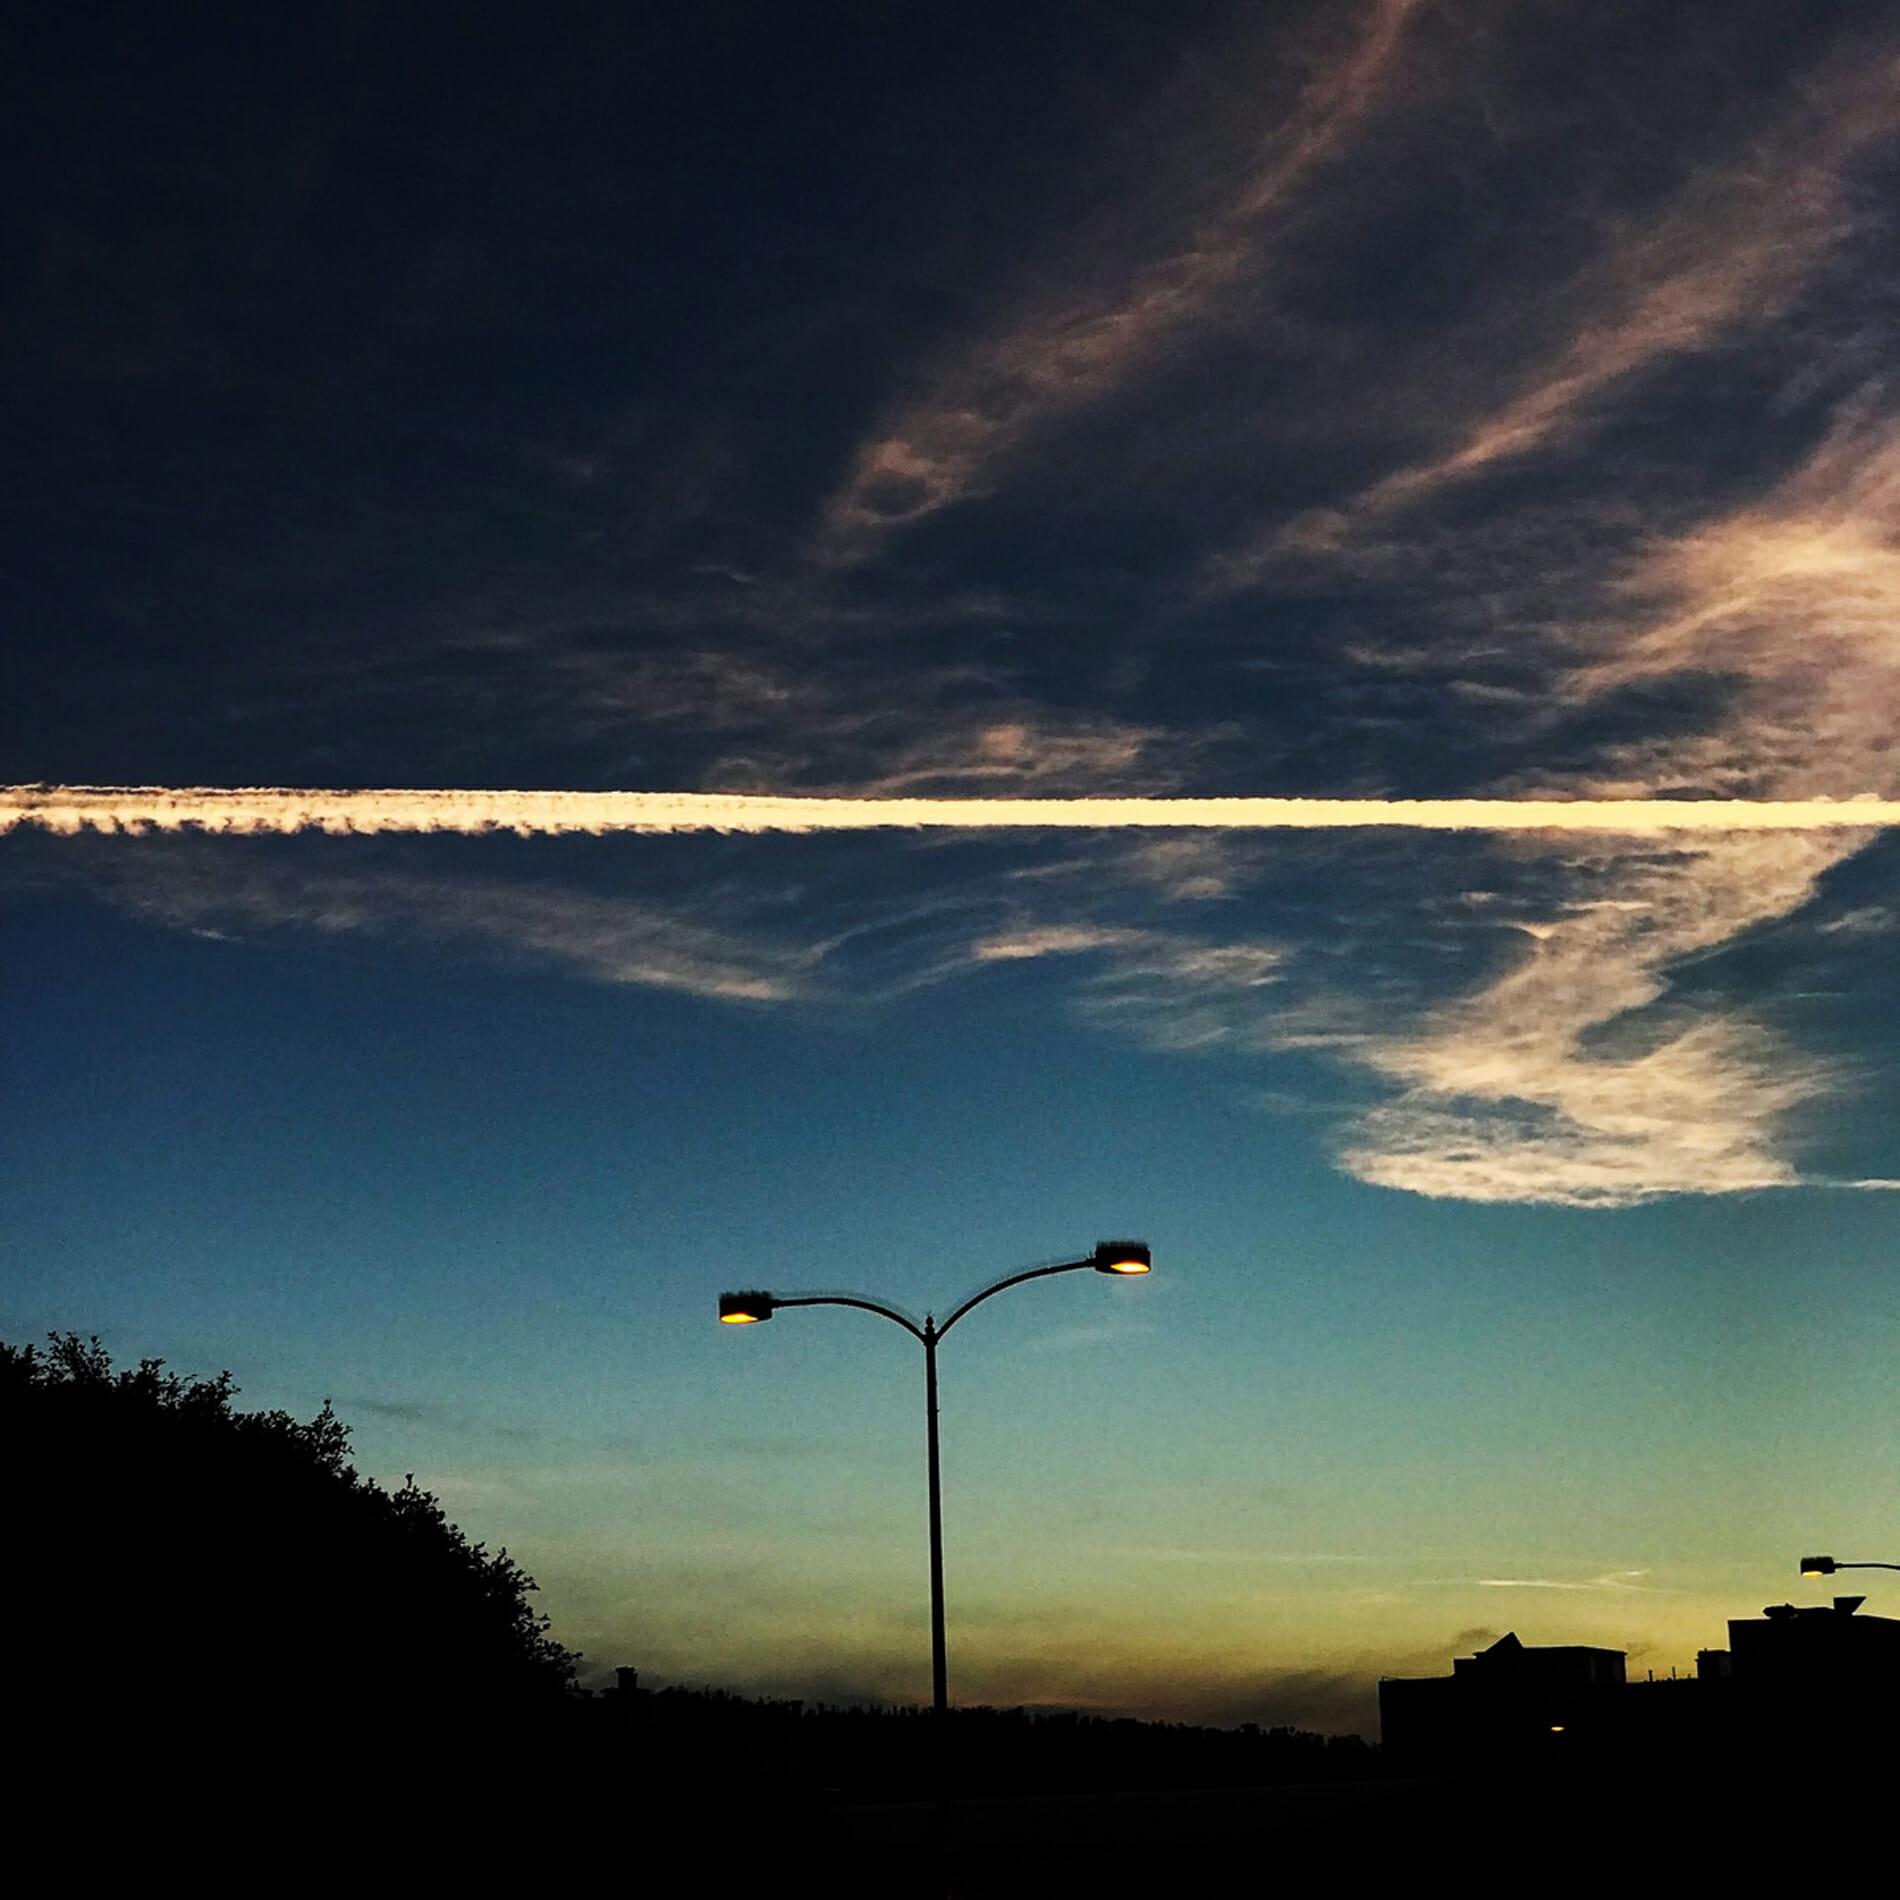 exhaust trail through sky